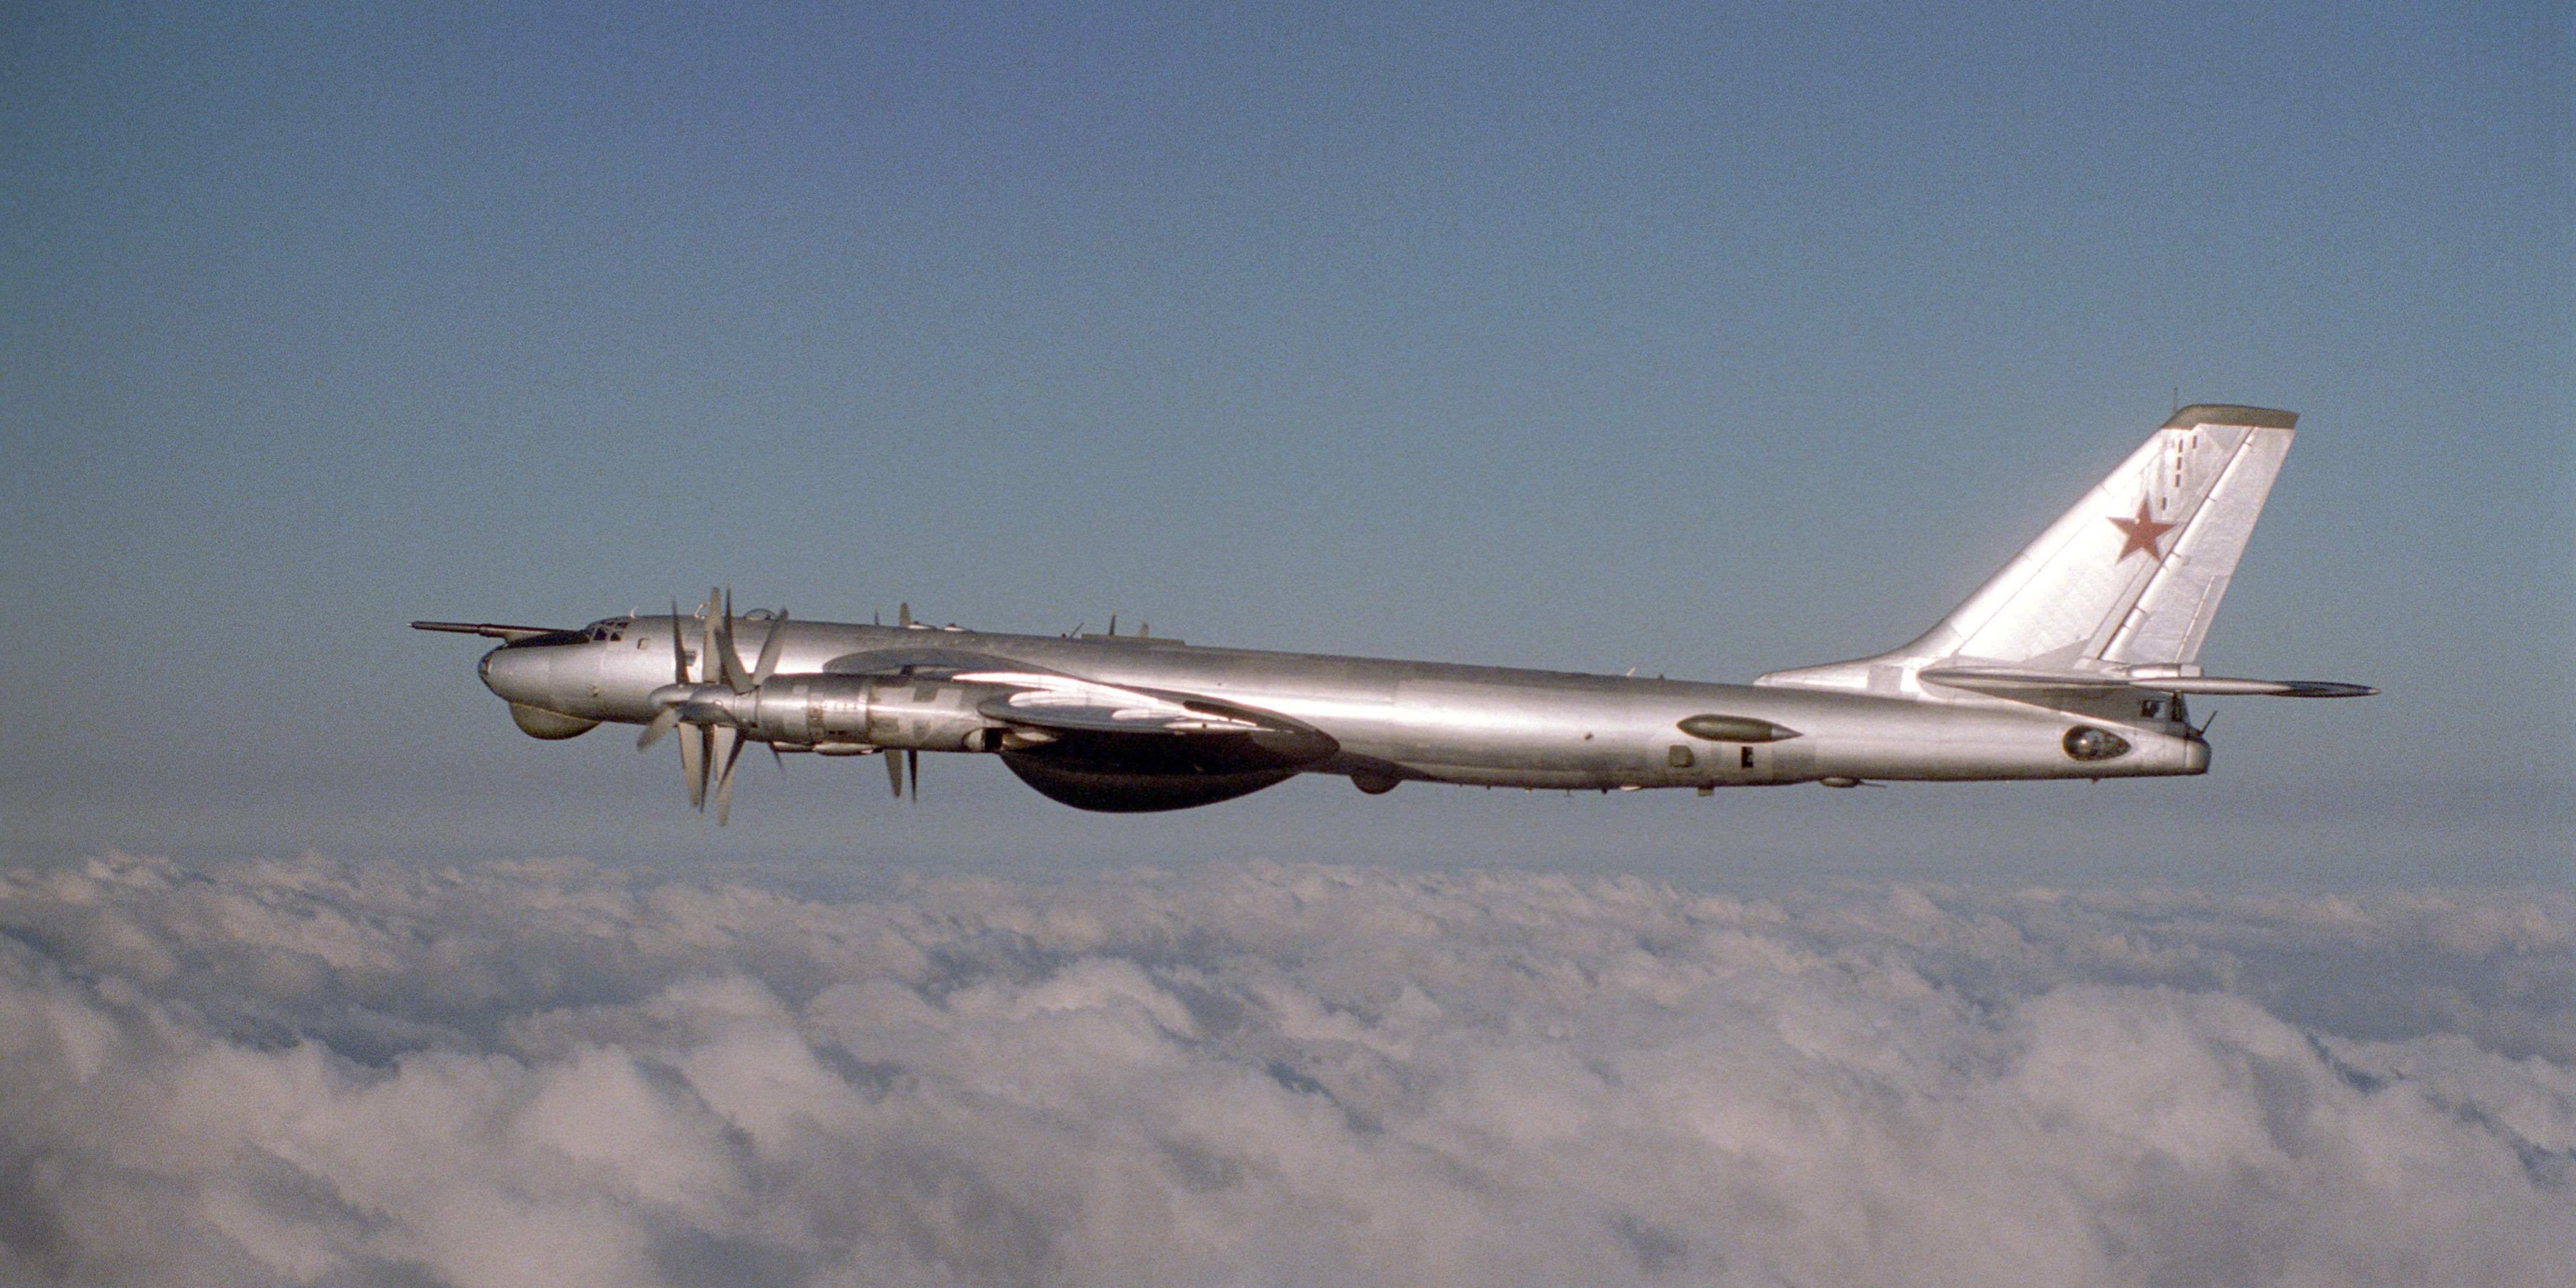 O Tupolev Tu-95 em 1983.